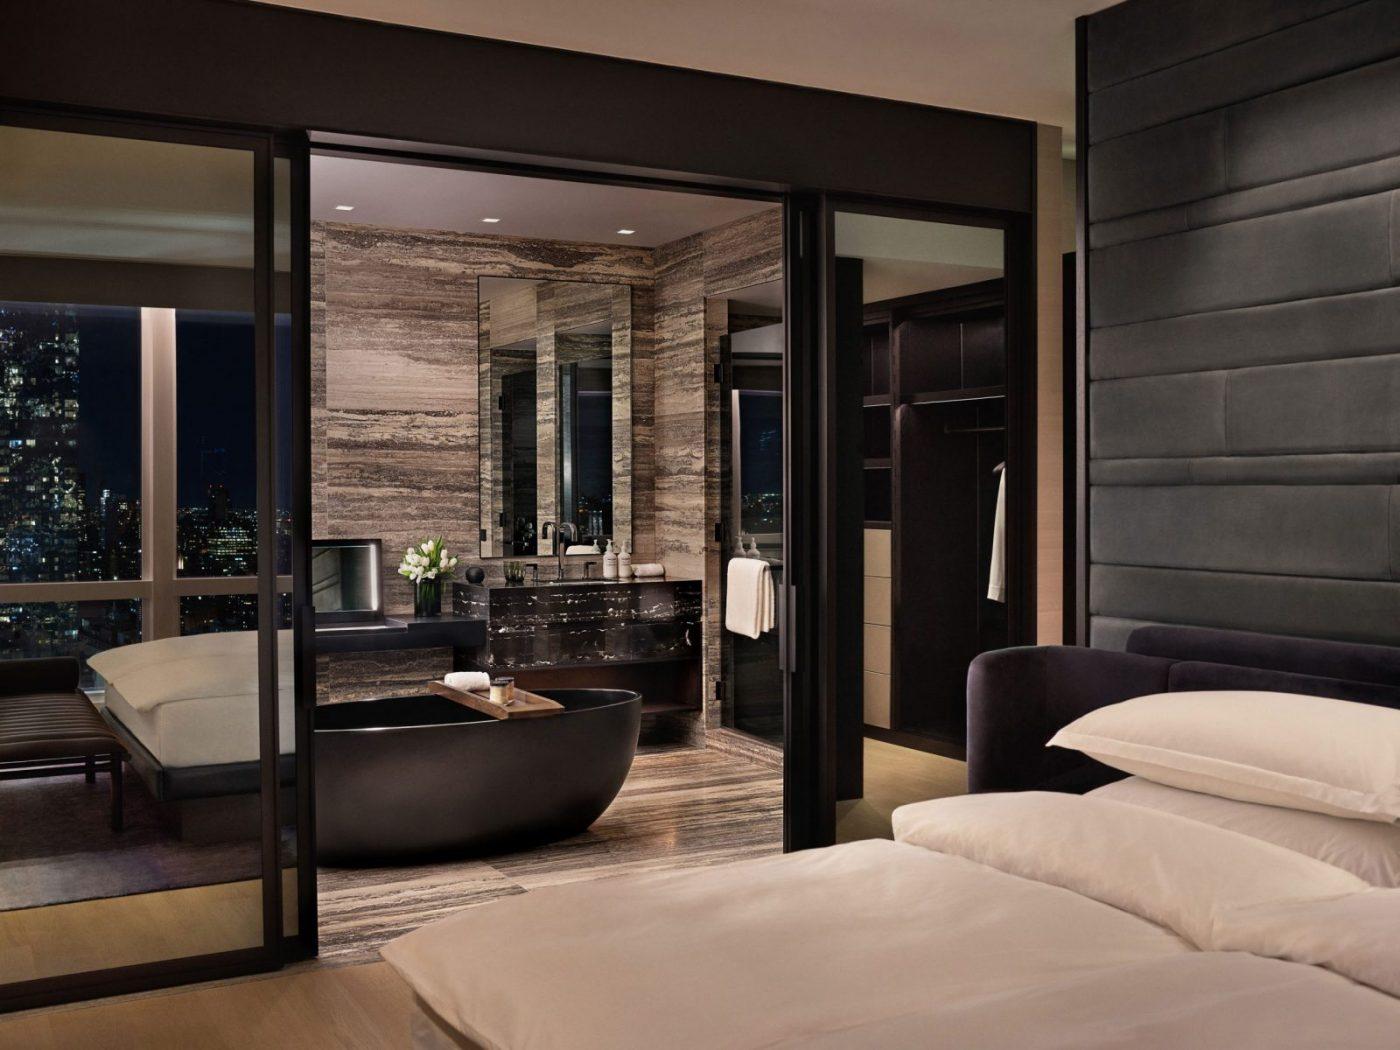 equinox suite with bathroom